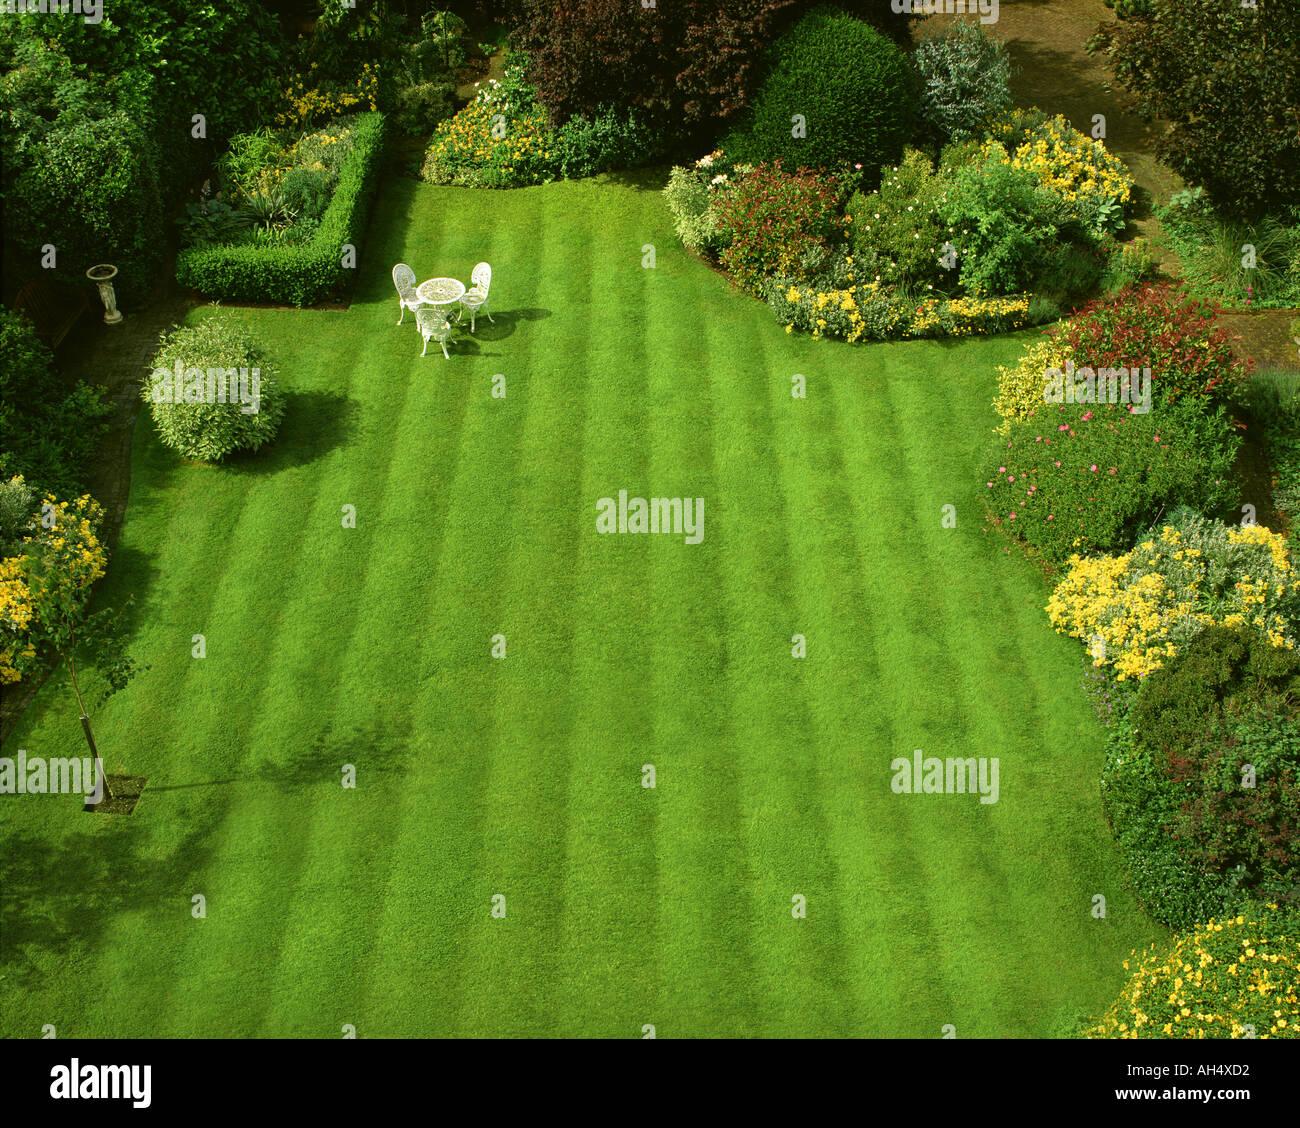 GB - GLOUCESTERSHIRE: Jardín Escena en Parkgate en Cheltenham Imagen De Stock